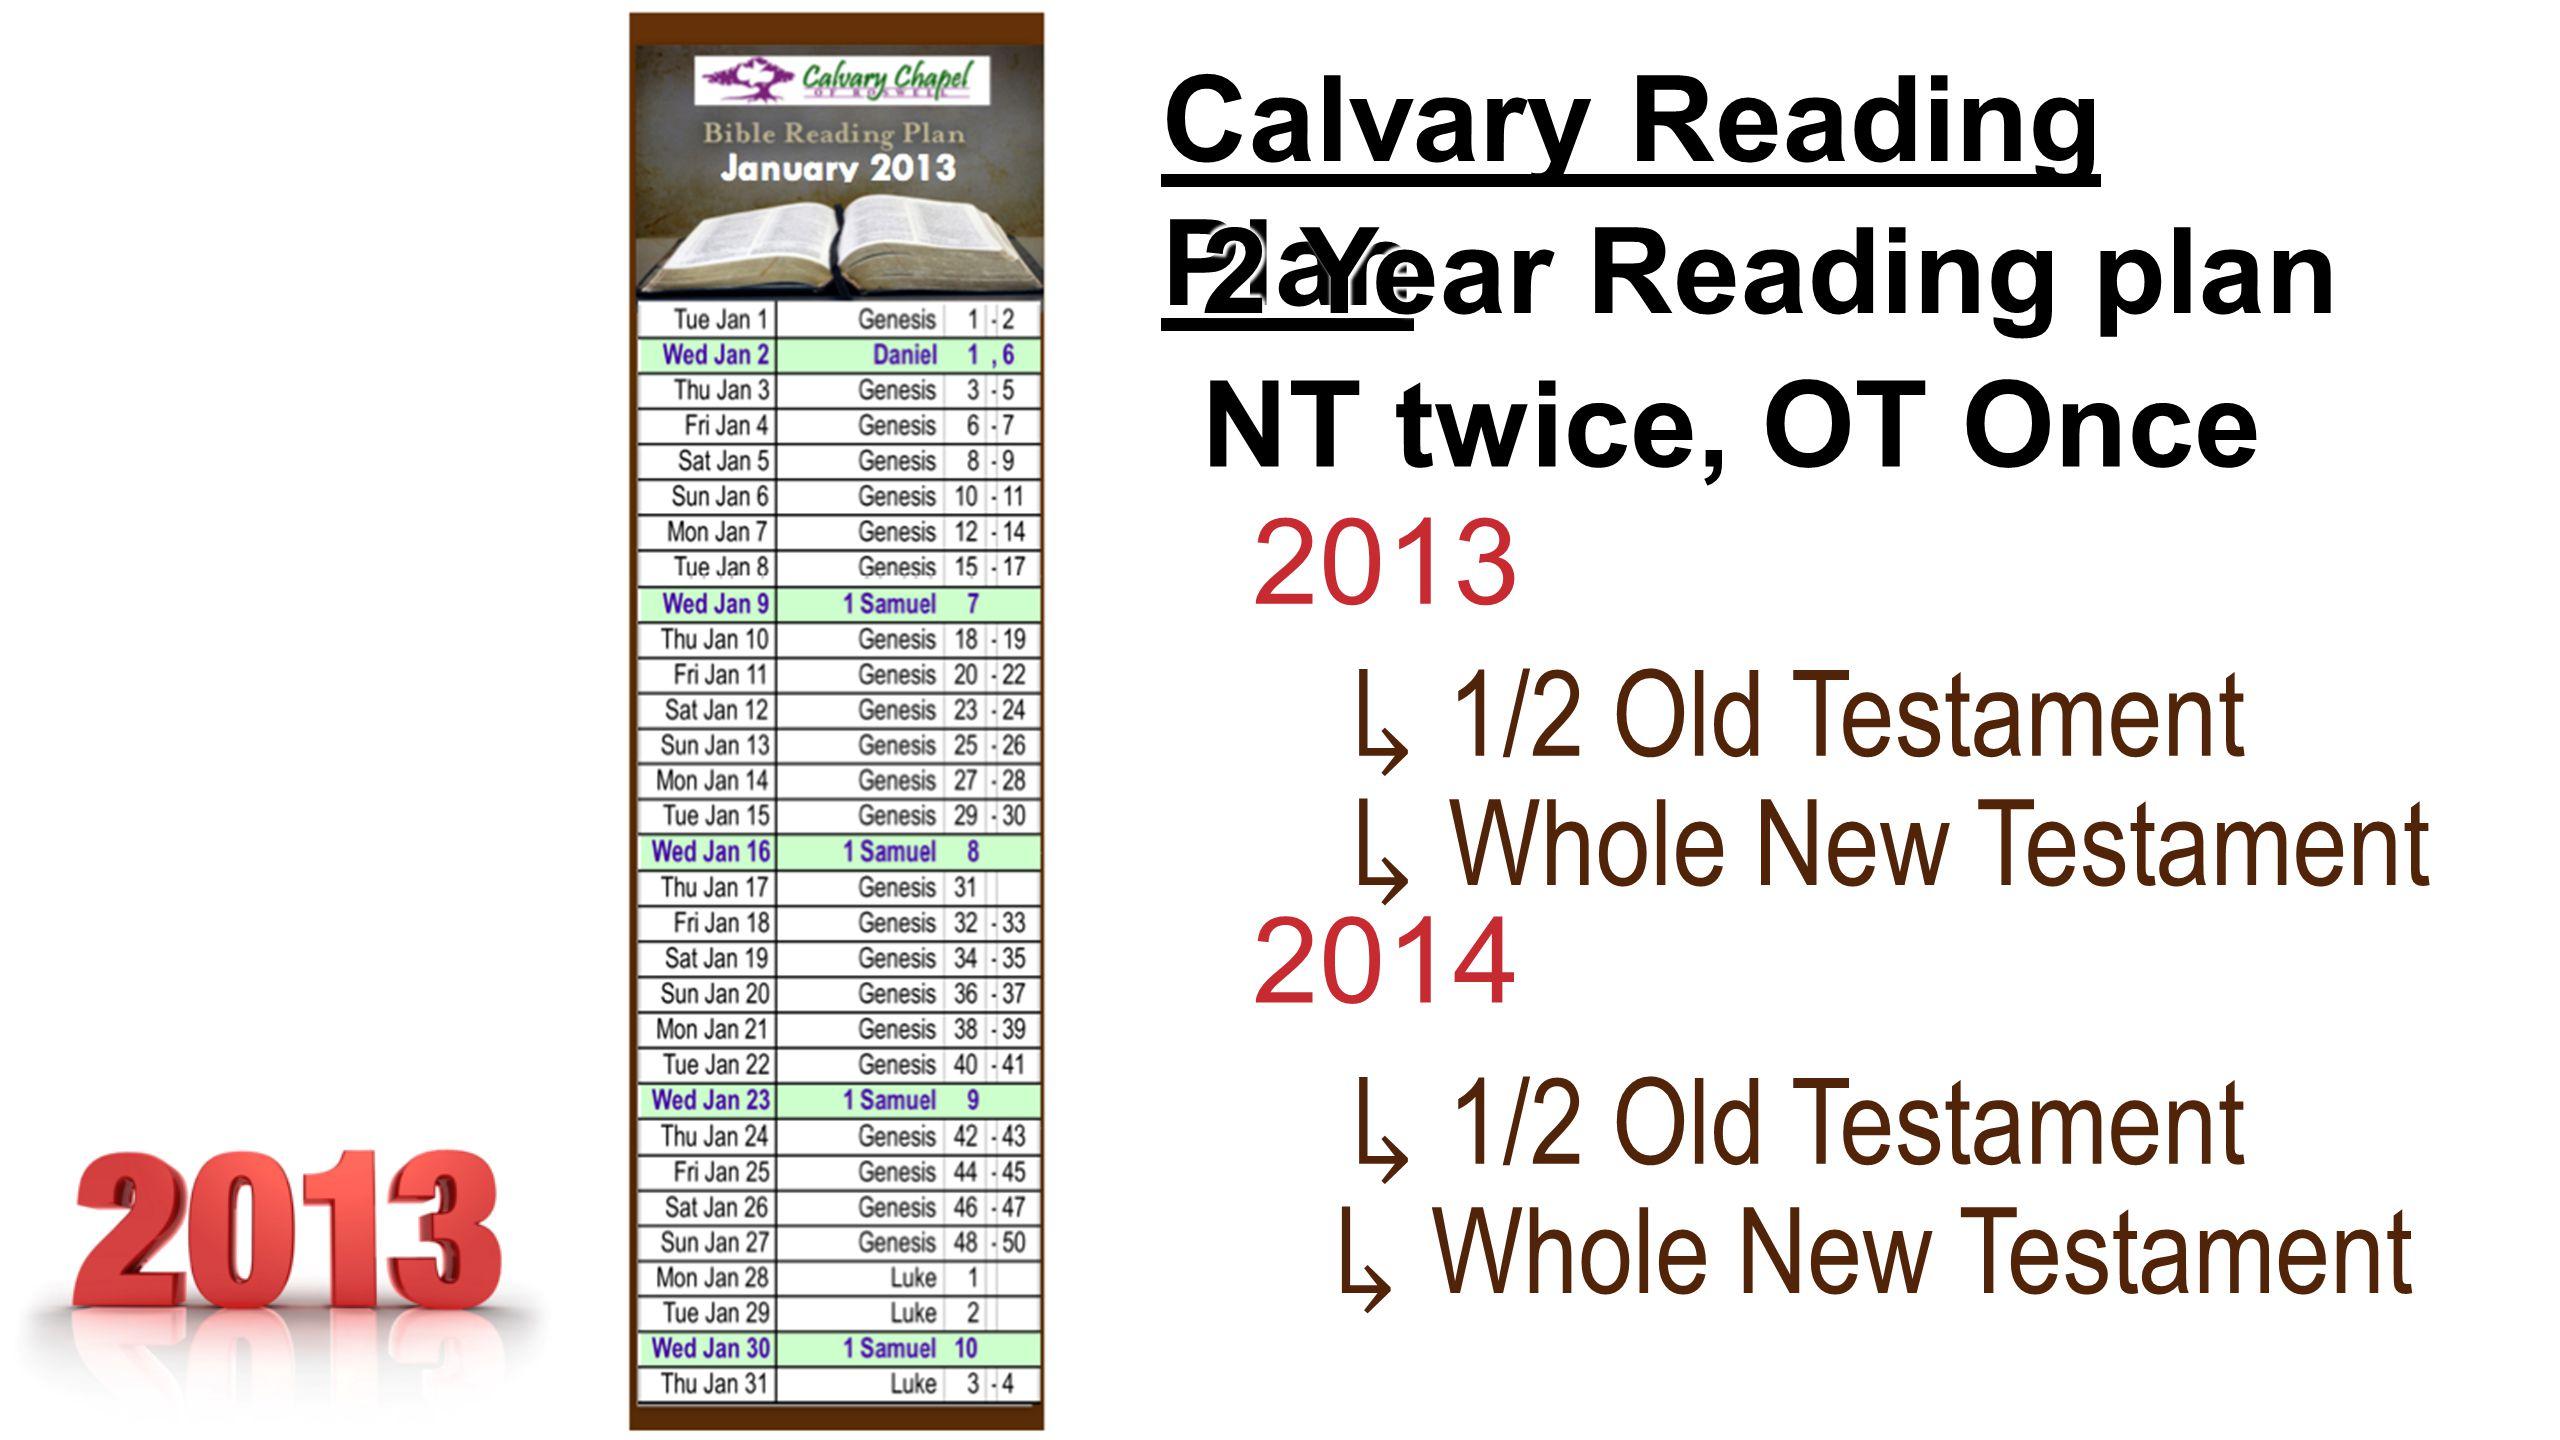 Page 779 in church Bibles Page 779 in church Bibles Chapter